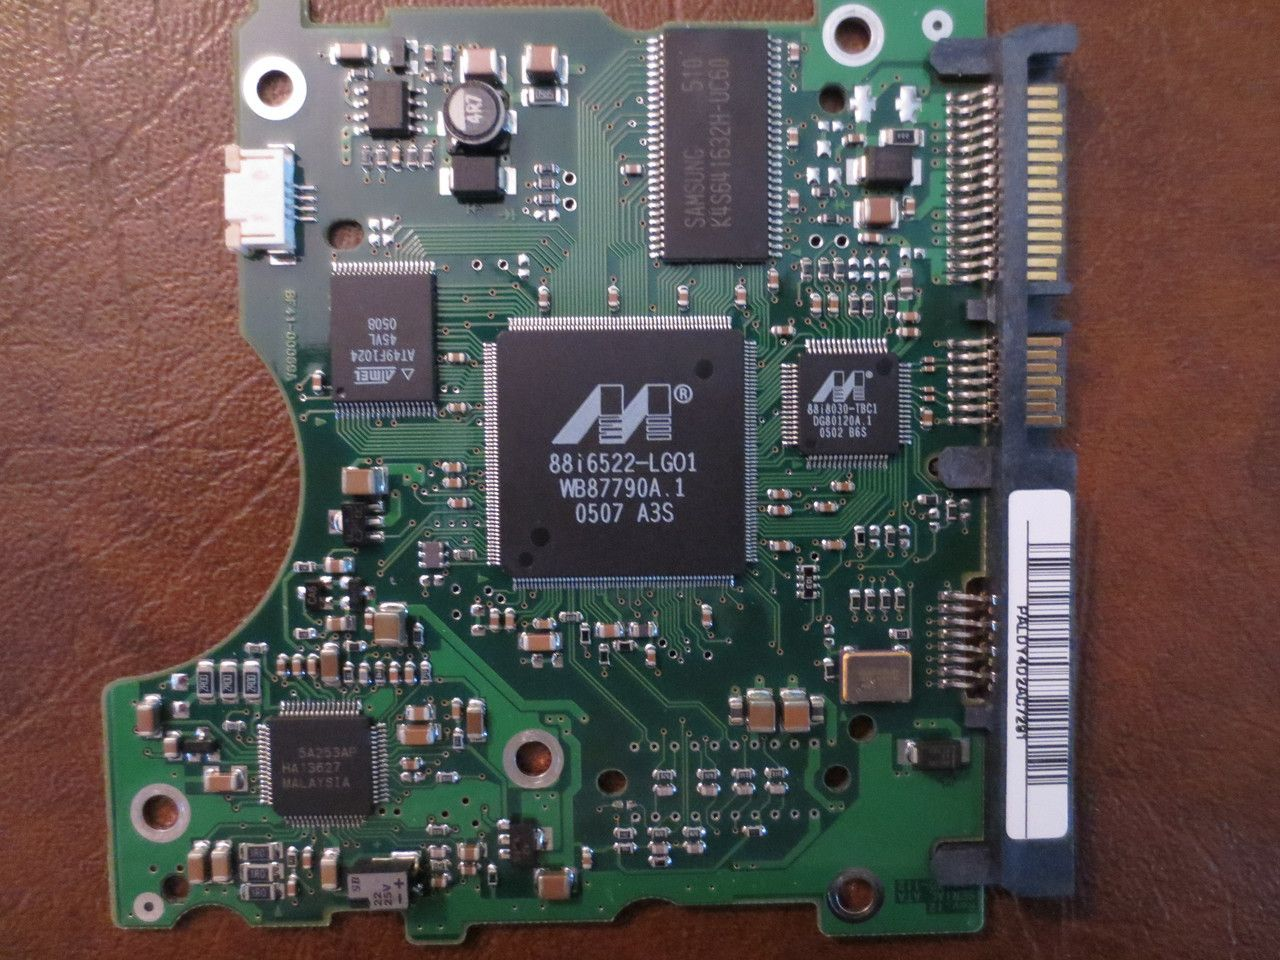 Samsung Sp1614c Reva Fw100 32 Bf41 00069a 160 Hard Drive Circuit Board Pcb Boards 160gb